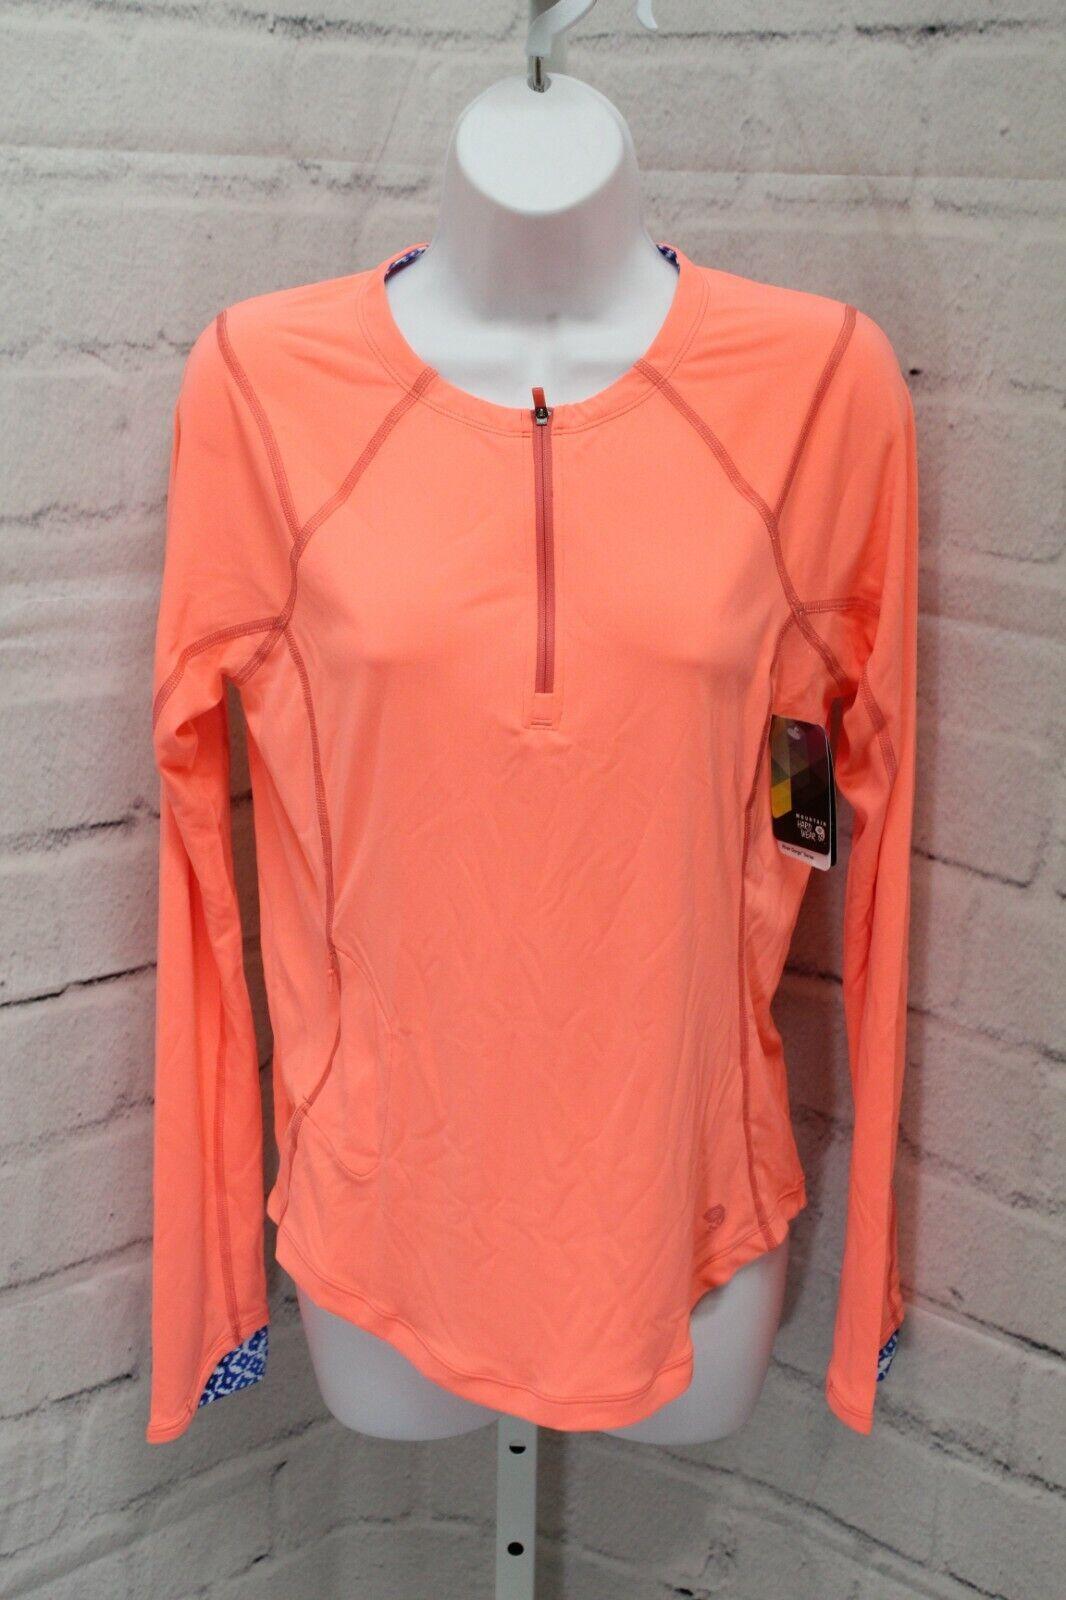 Mountain Hardwear River Gorge Long Sleeve Tee Shirt, Women's Size M, Coralescent